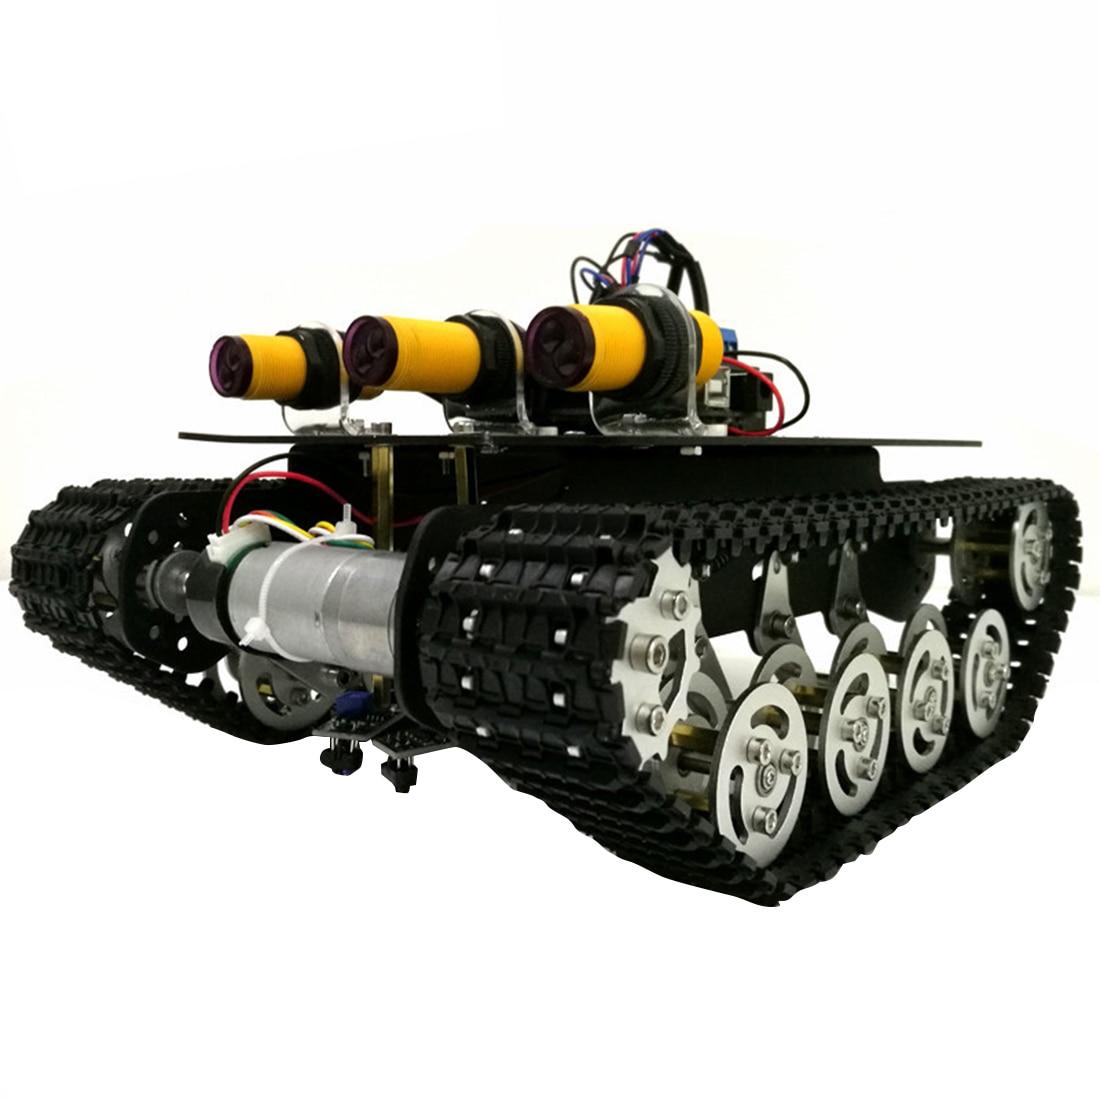 DIY Intelligent RC Car Kit Infrared Tracking Obstacle Avoidance Sensor Metal Track Shock Absorber Tank Suspension Robot Toy